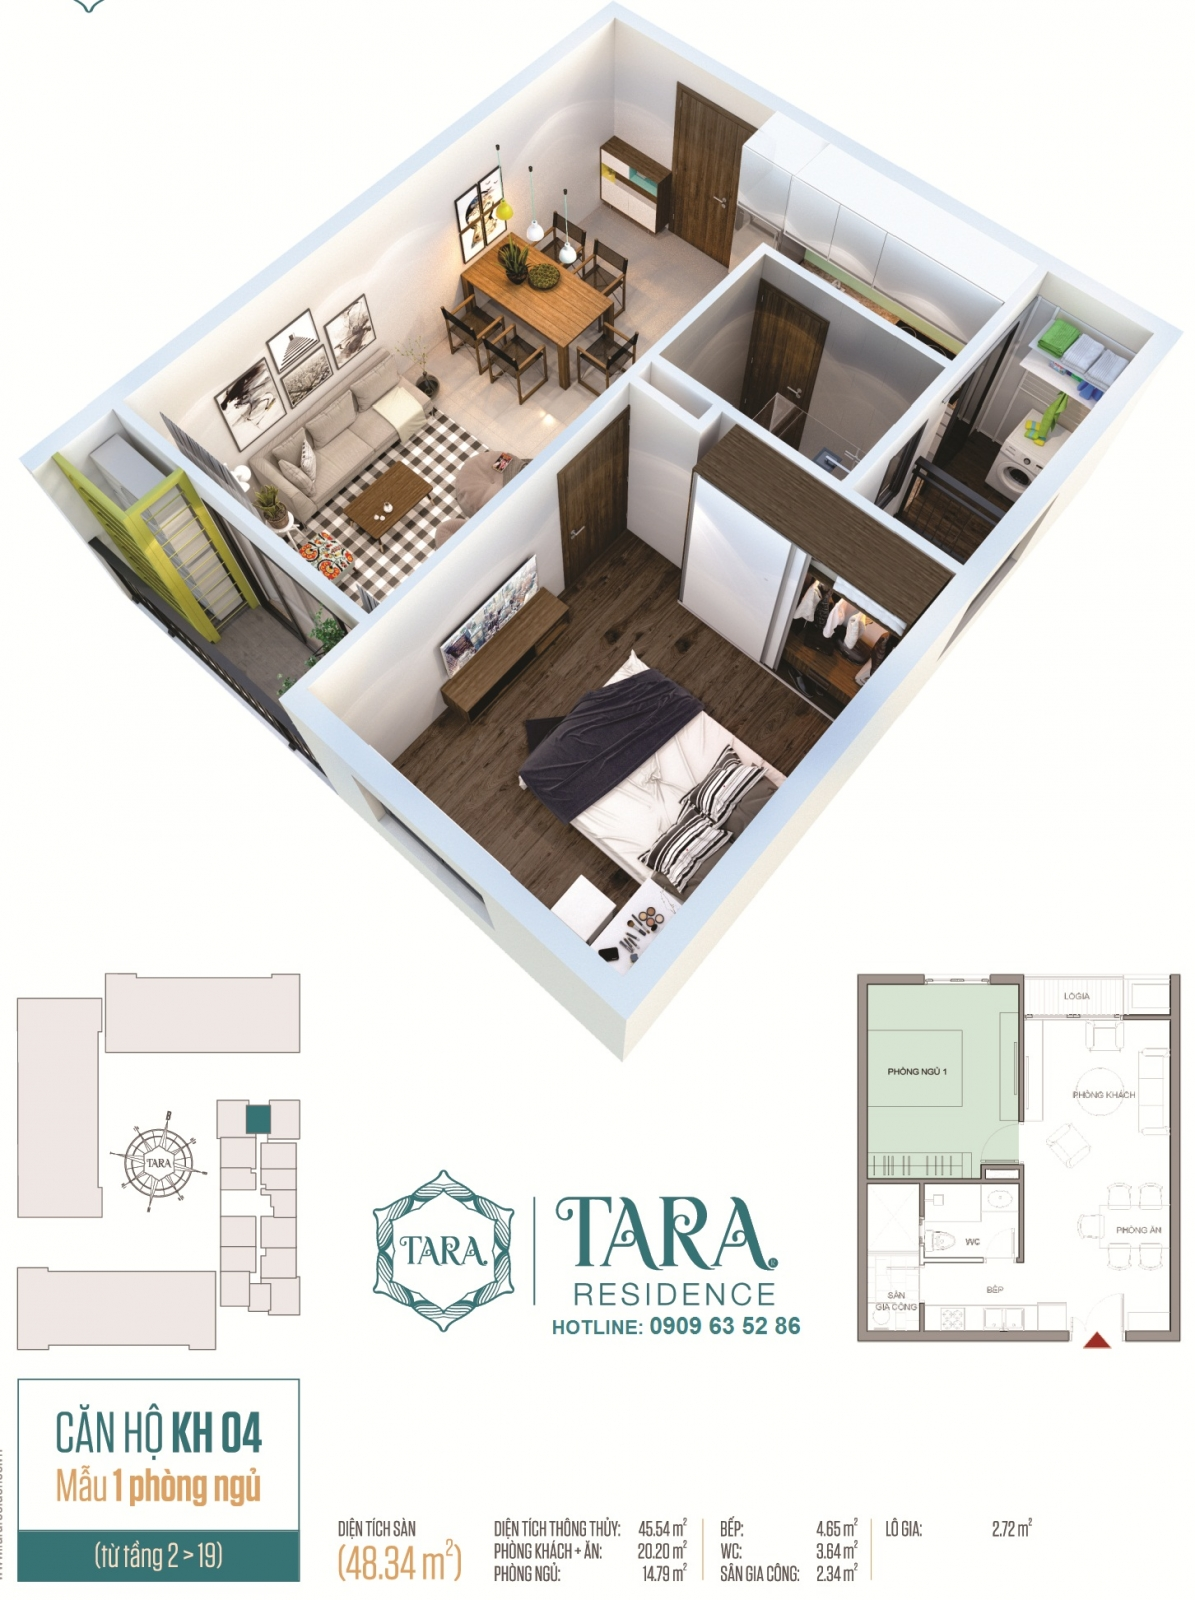 Thiết kế căn hộ Tara Residence